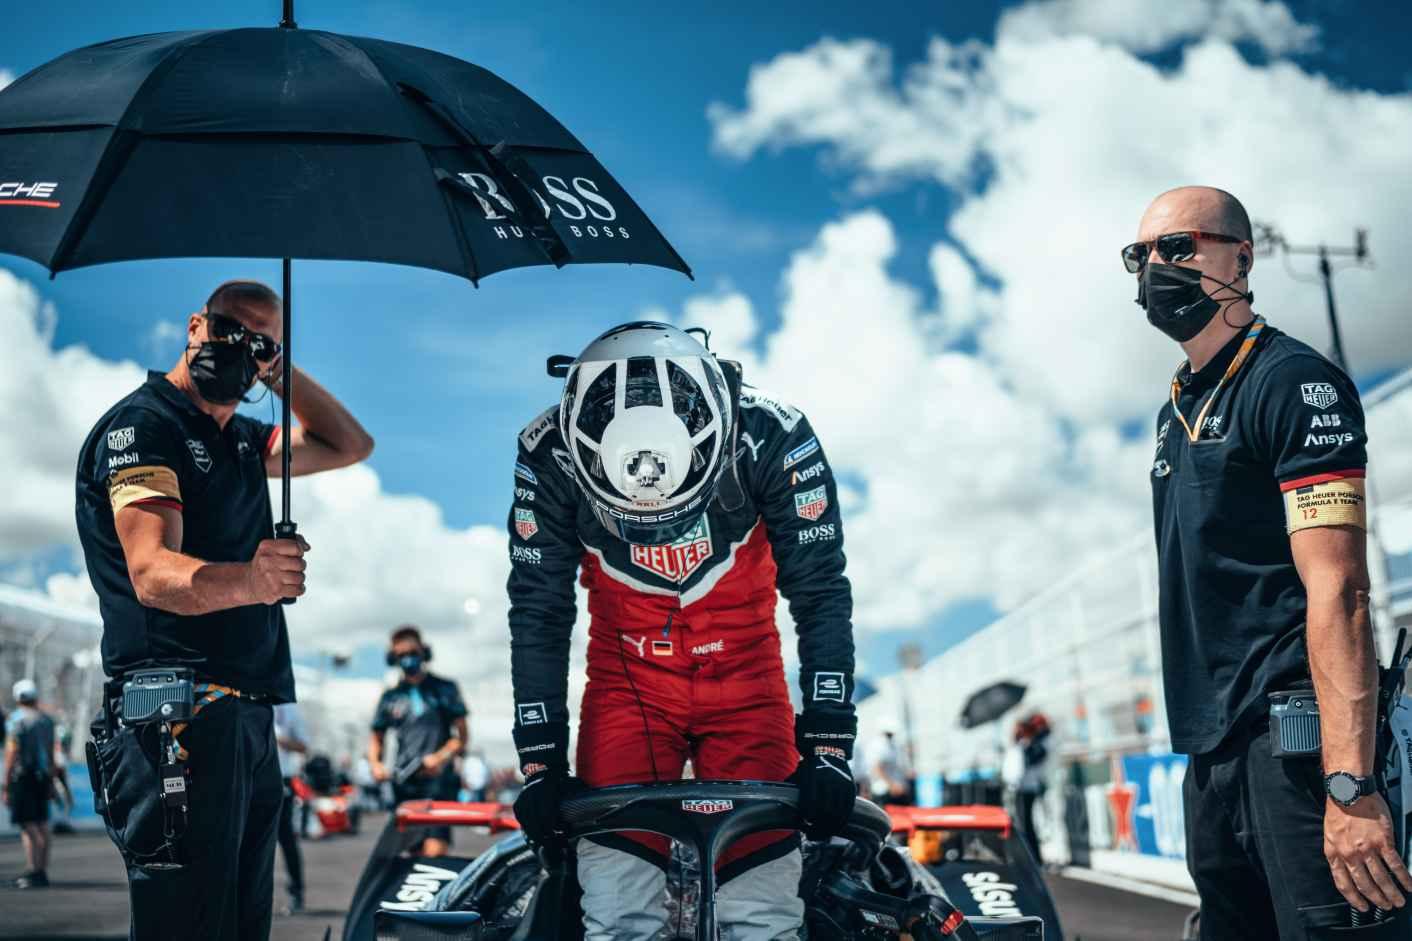 Andre Lotter, Grupo de Fórmula E de DAG Heuer Porsche